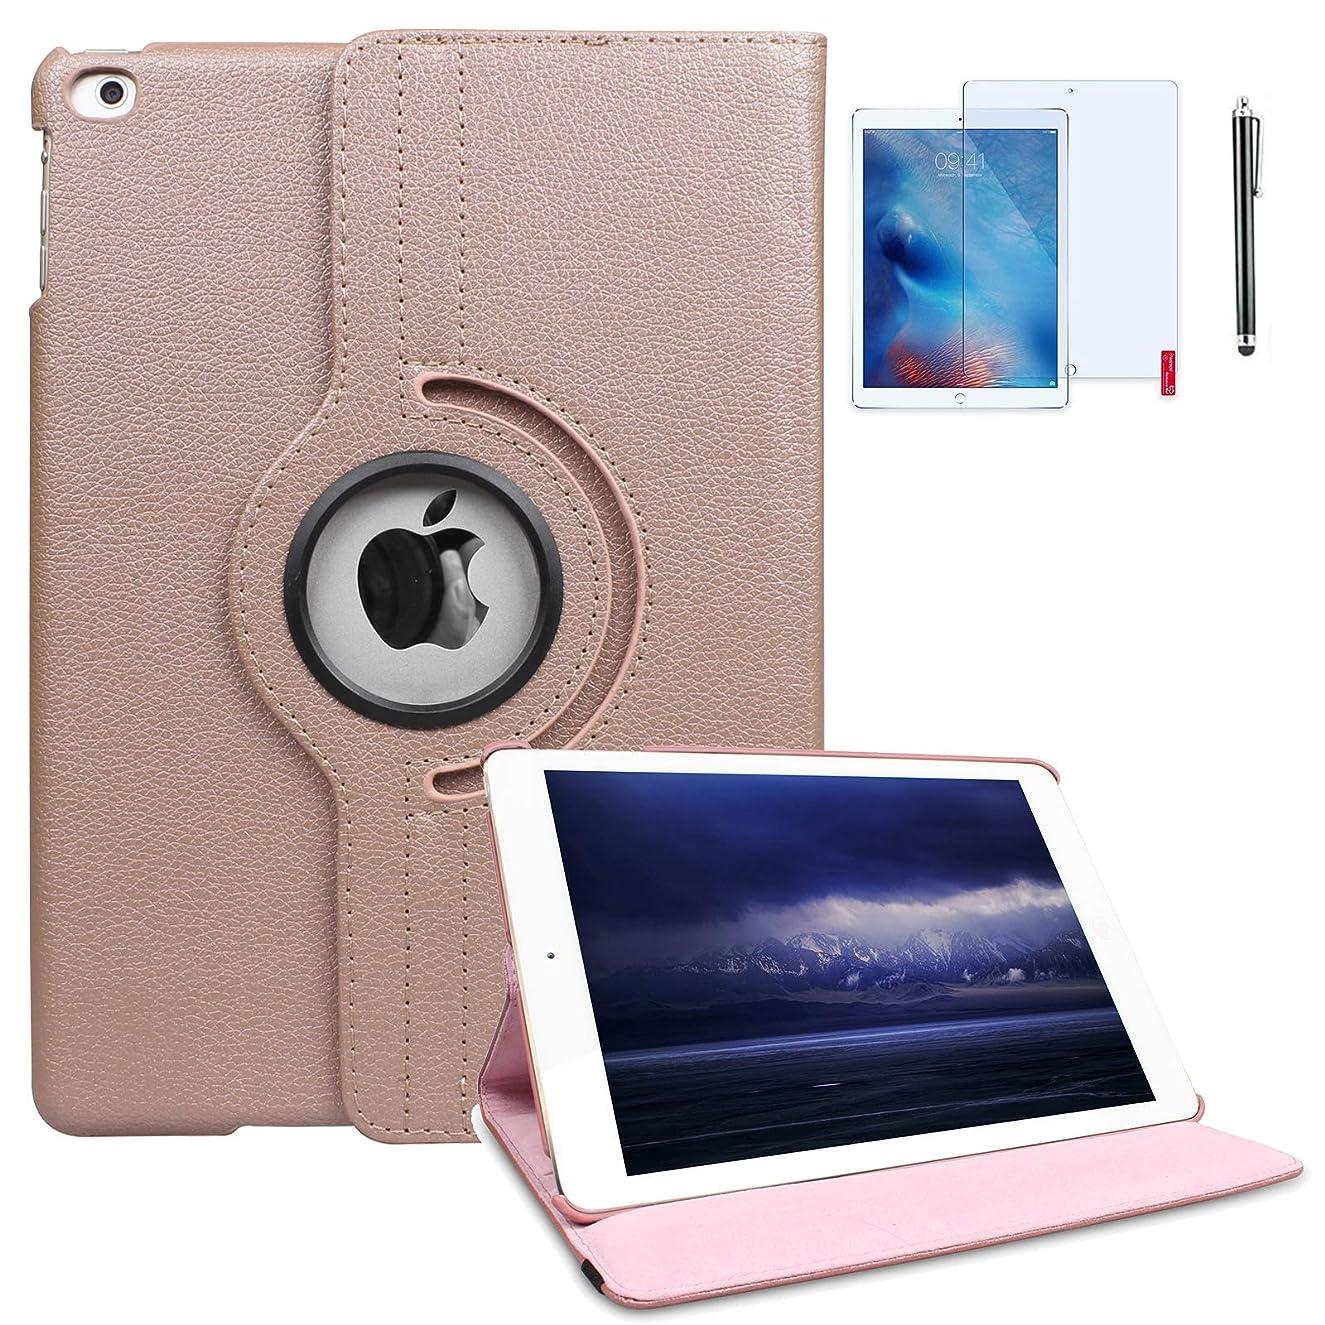 iPad Mini Case (1/2/3) 7.9